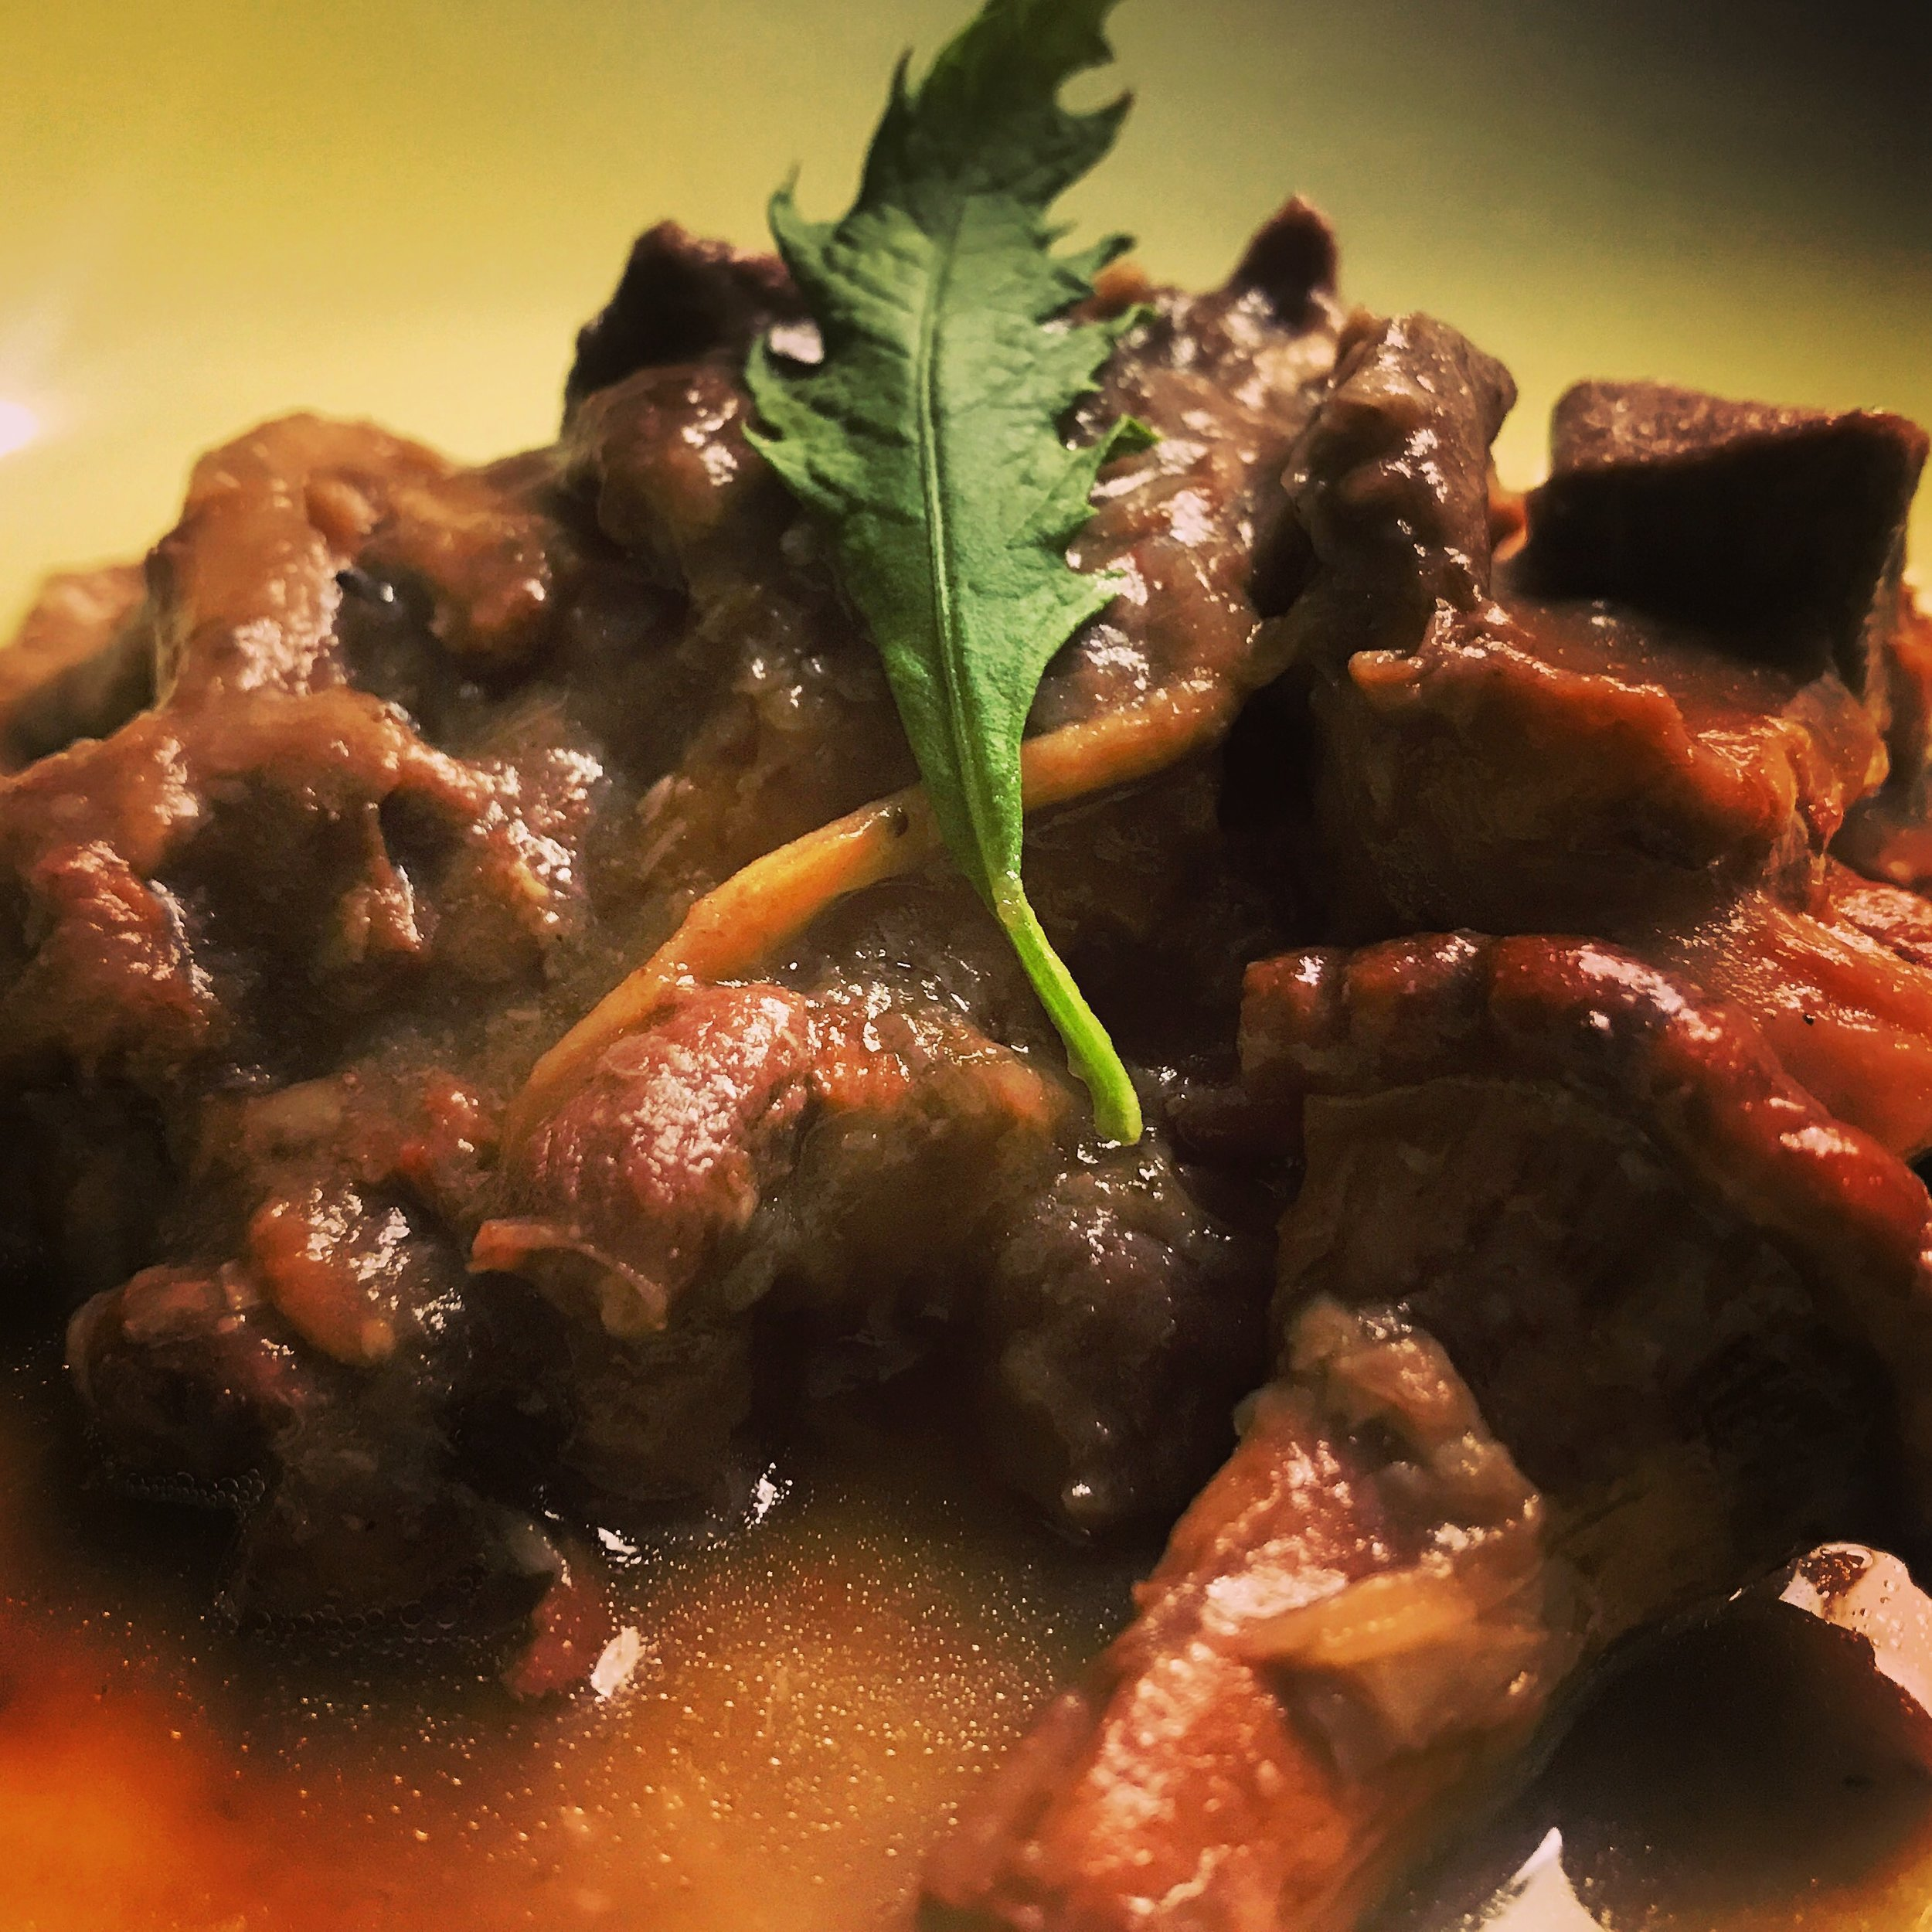 ṭoot tawwa-sii • venison stew